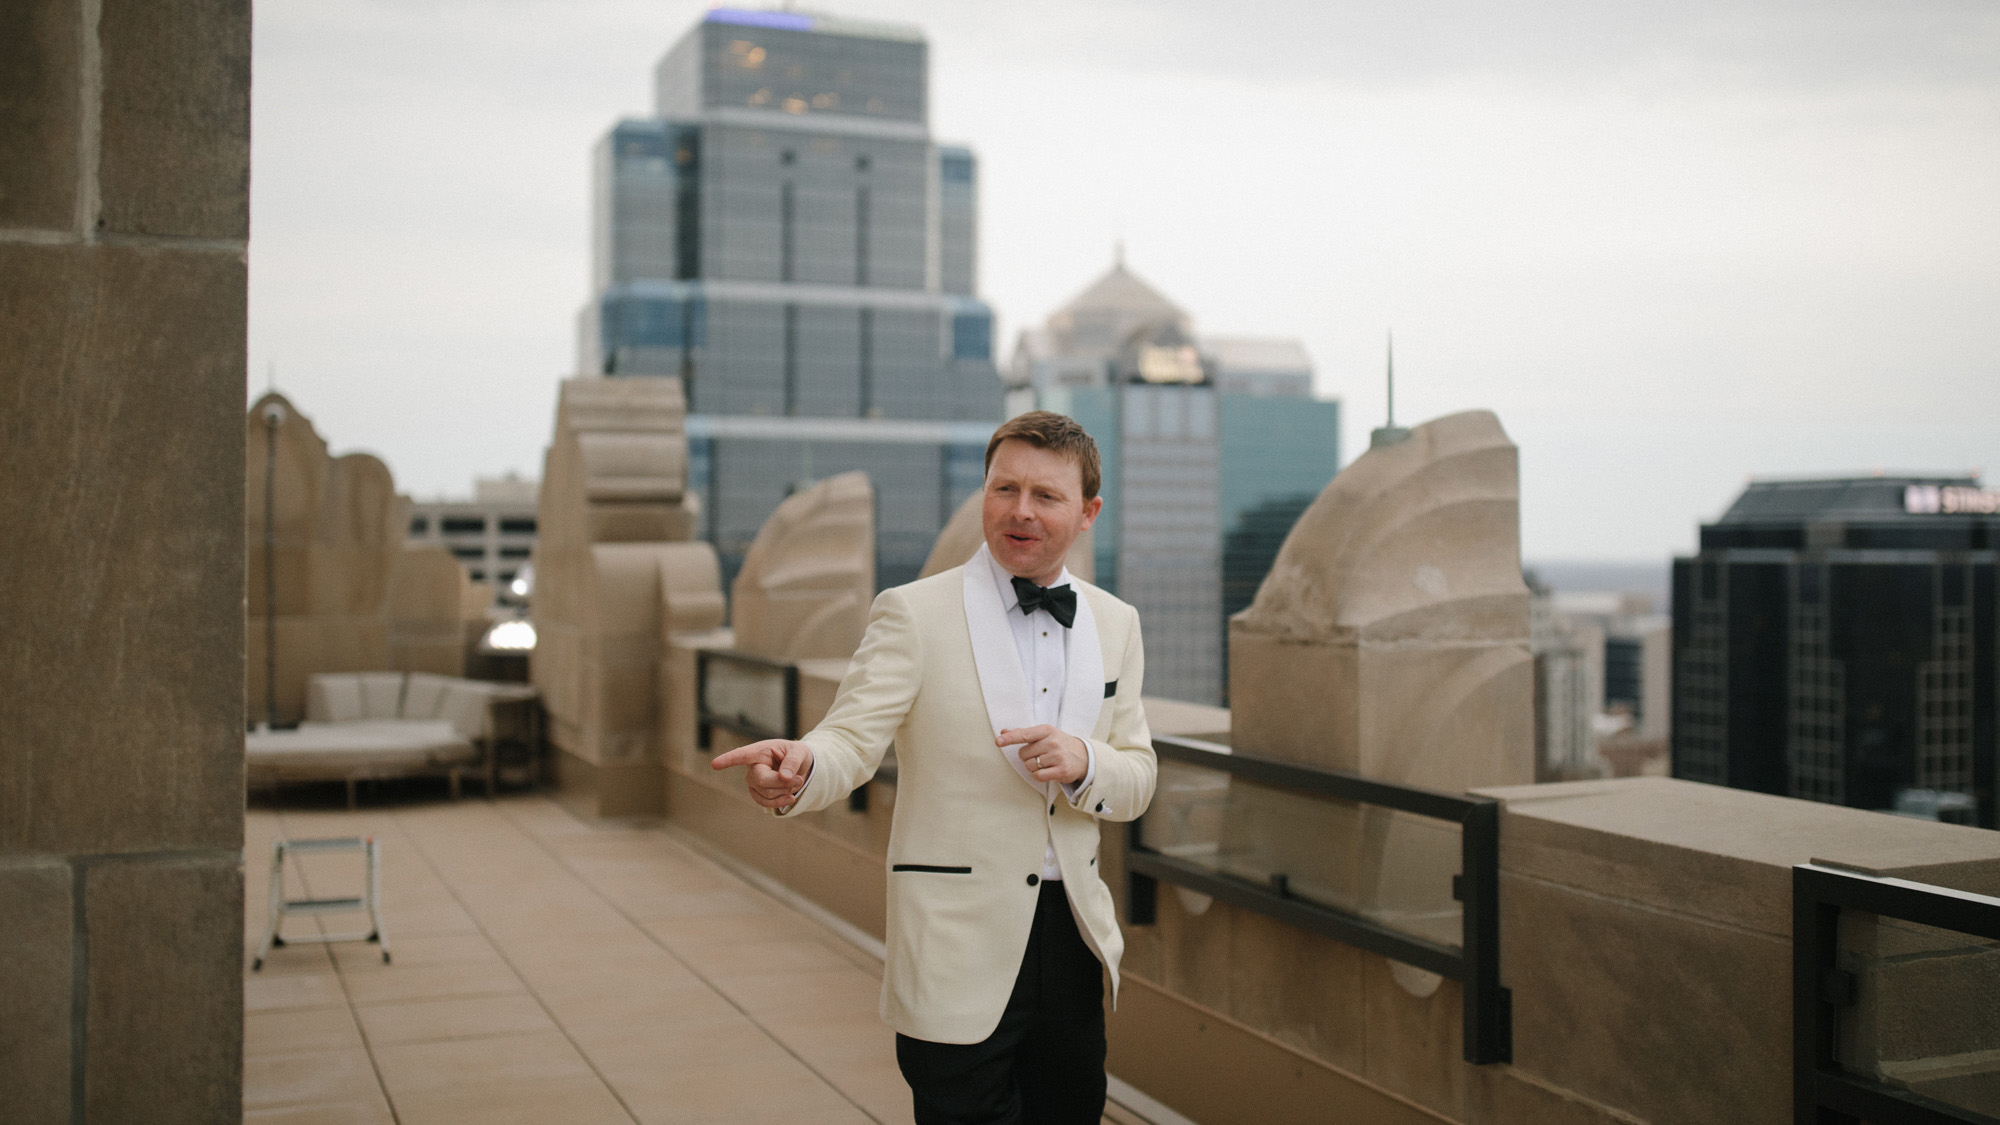 Alec_Vanderboom_kansas_city_hip_wedding_photos-0074.jpg